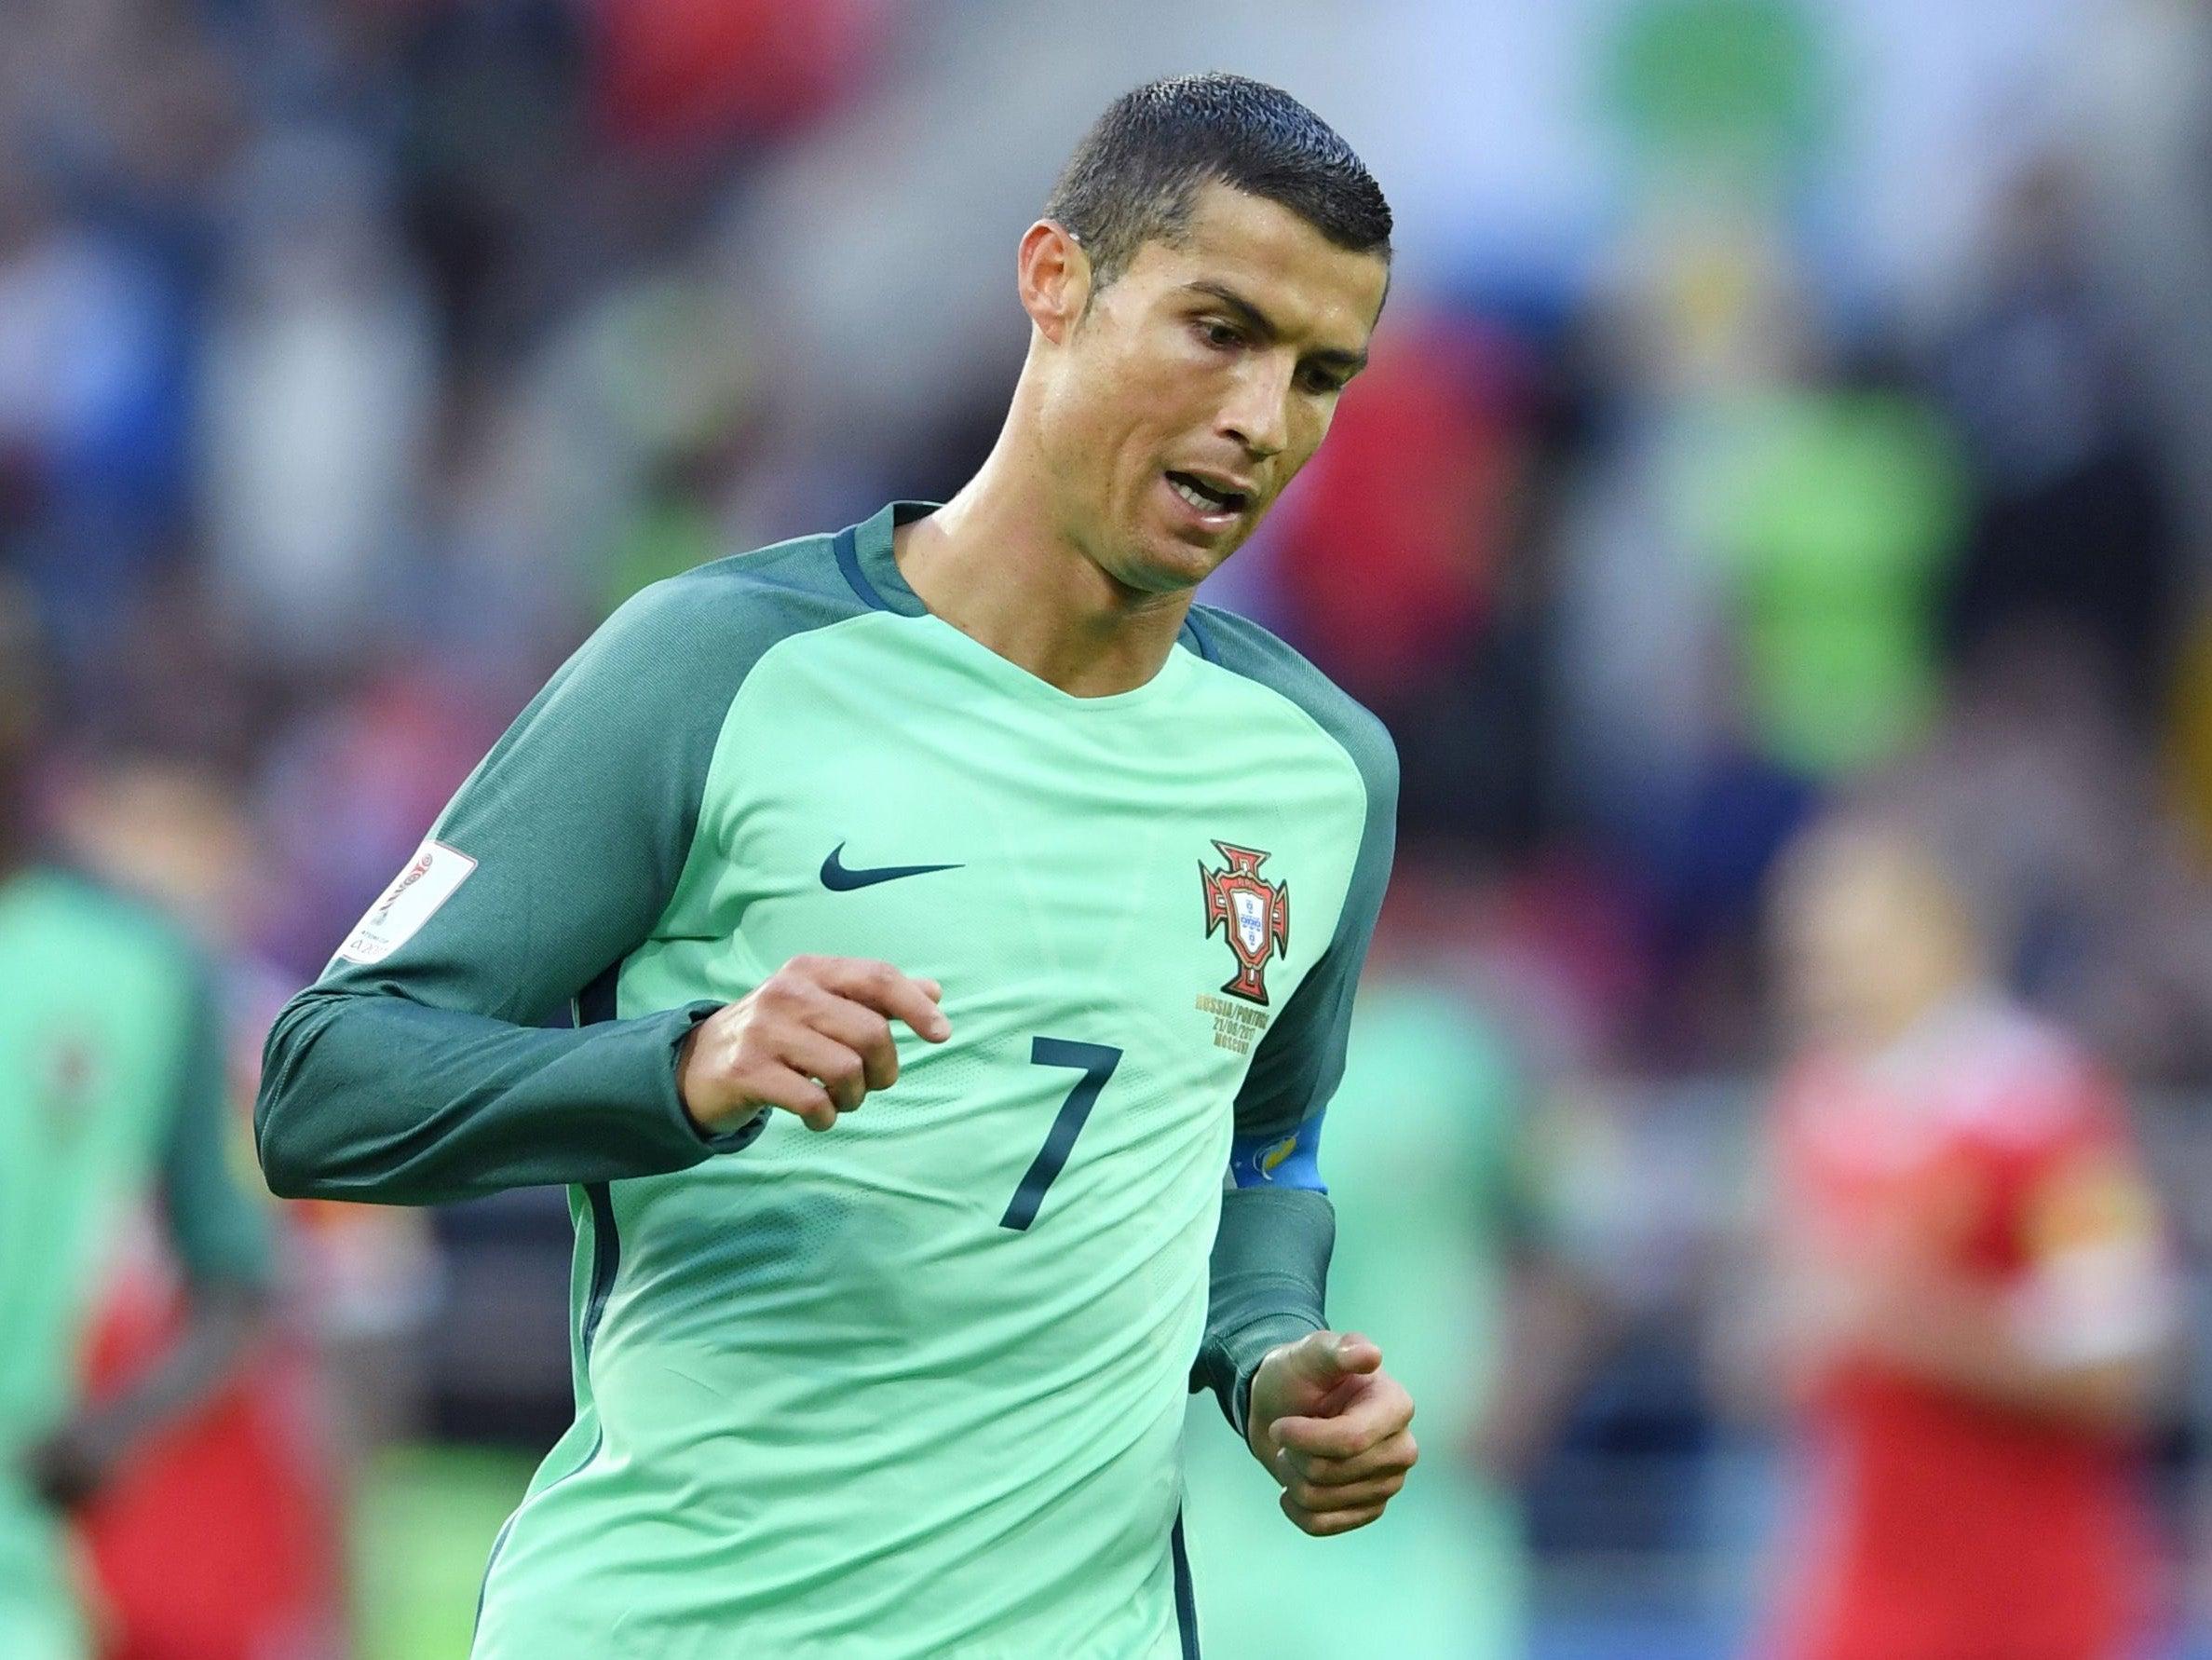 Cristiano Ronaldo faces imprisonment for non-payment of taxes 31.07.2017 59